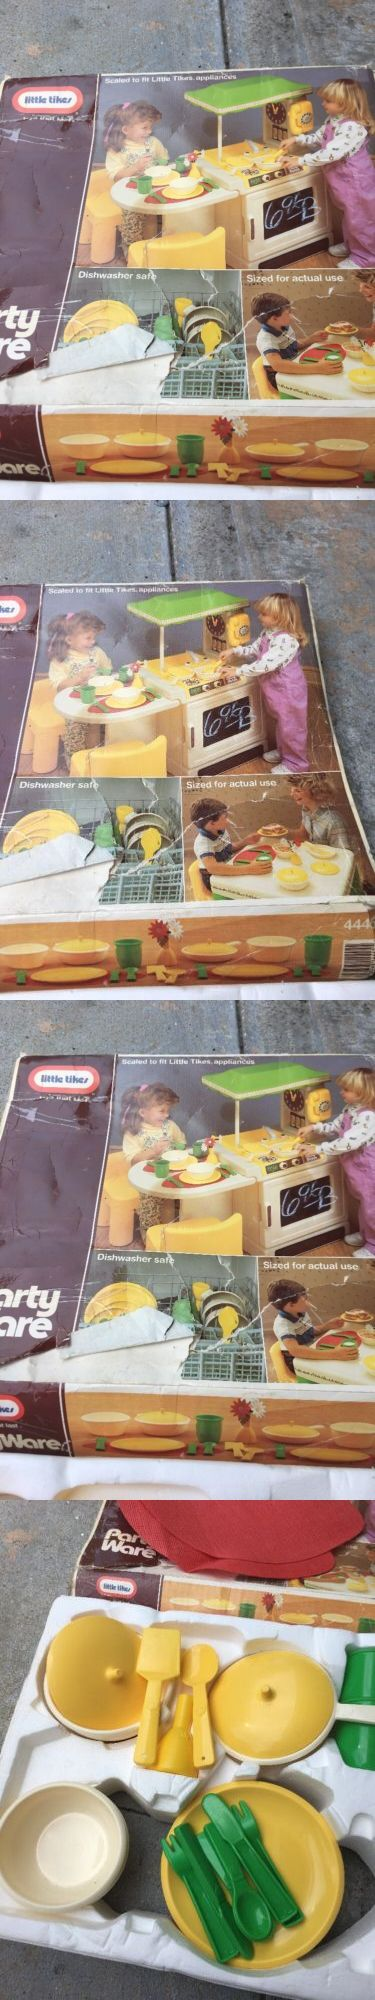 Más de 20 ideas increíbles sobre Küche kaufen ebay en Pinterest - küchen günstig kaufen ebay